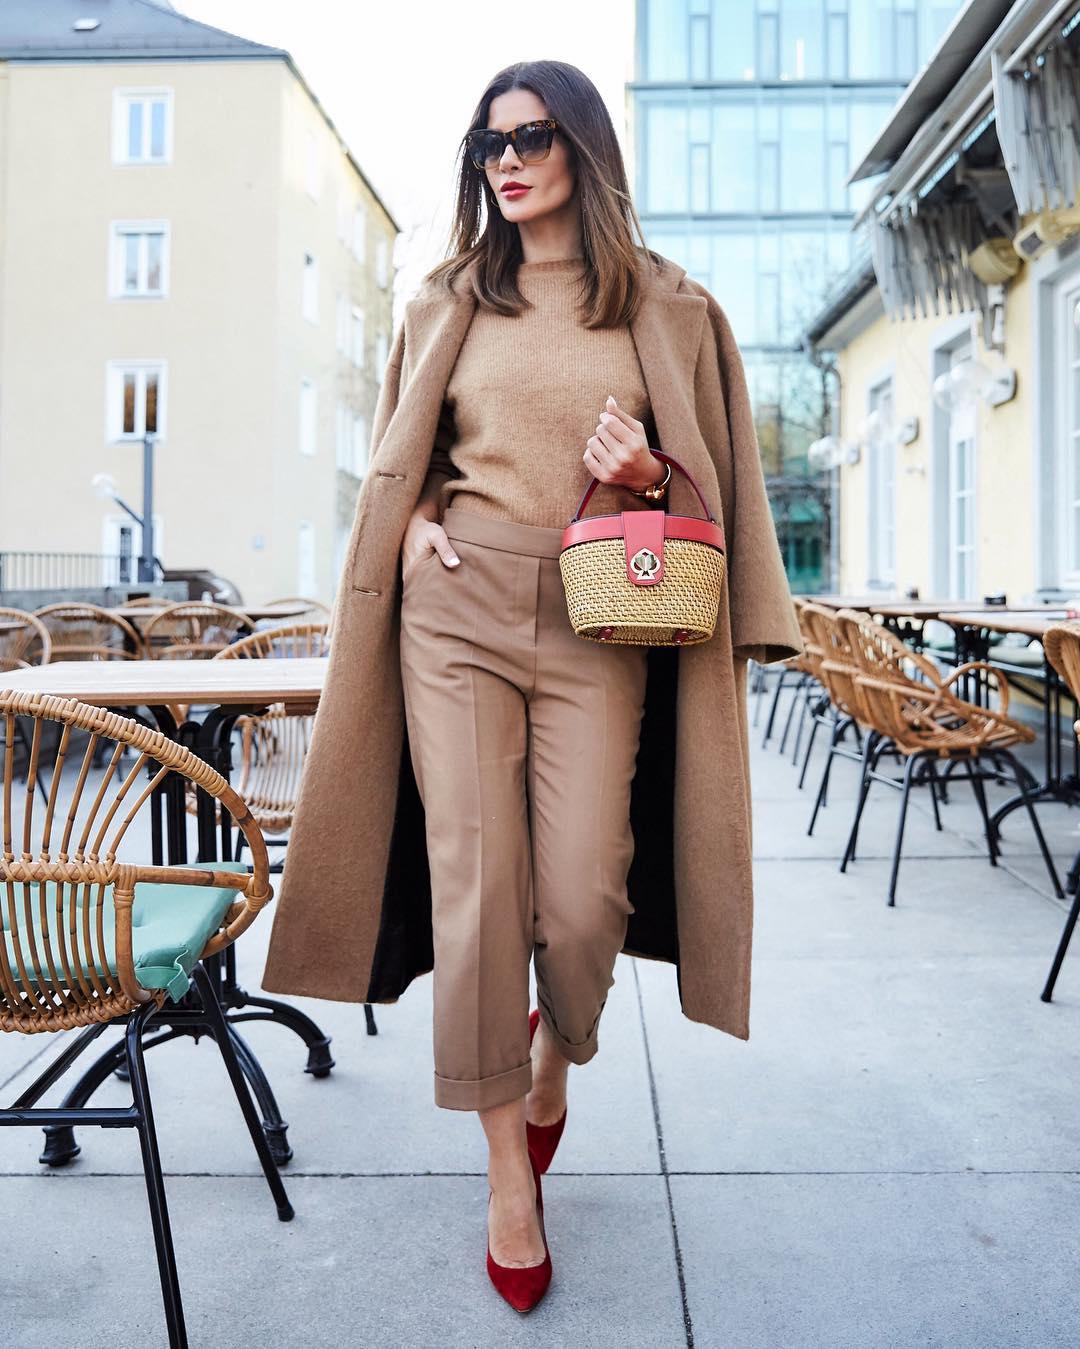 брюки женские 2019 фото 12